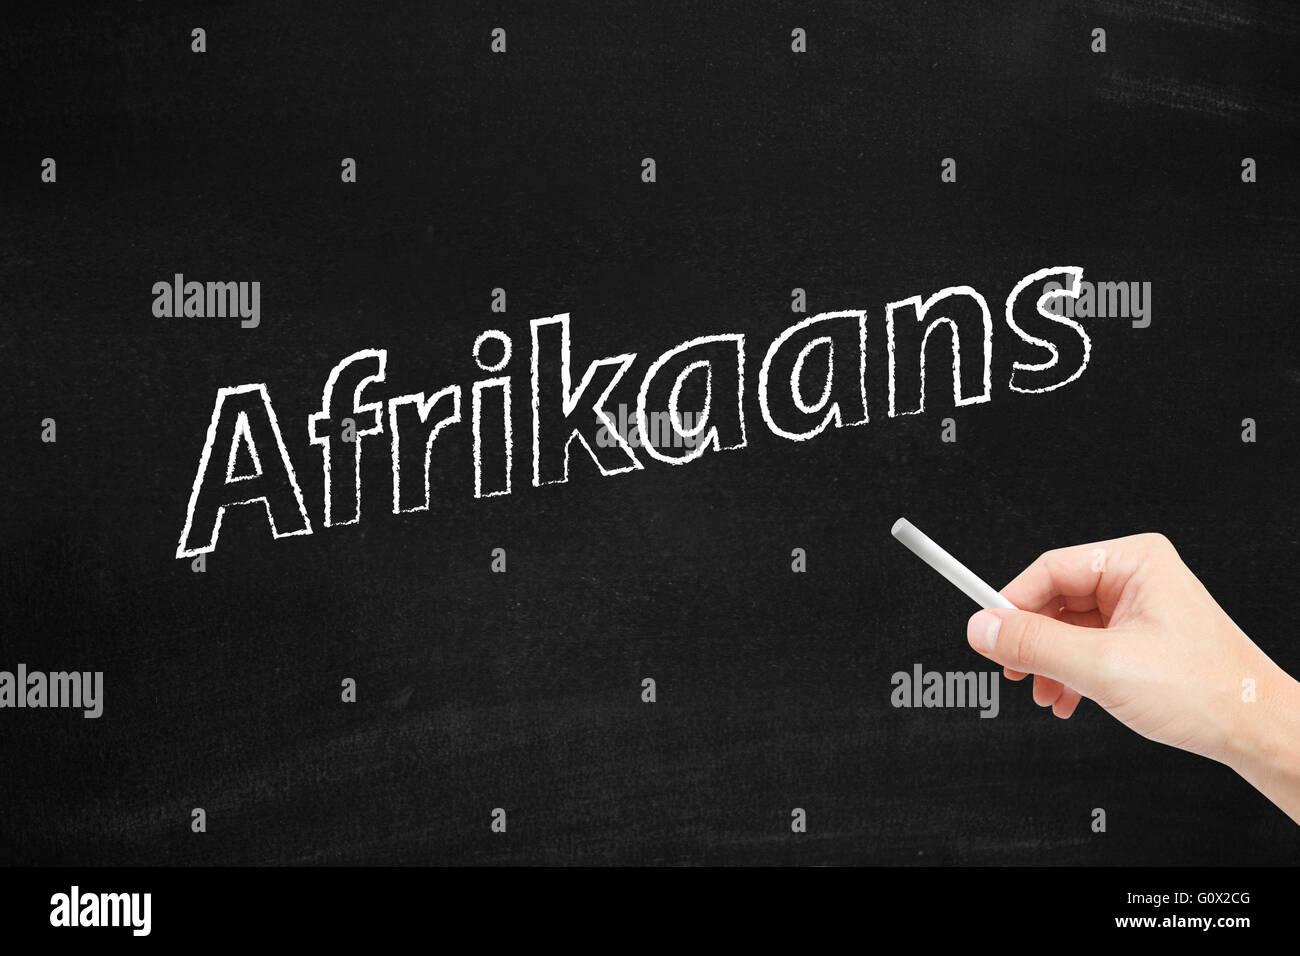 The language of Afrikaans written on a blackboard - Stock Image